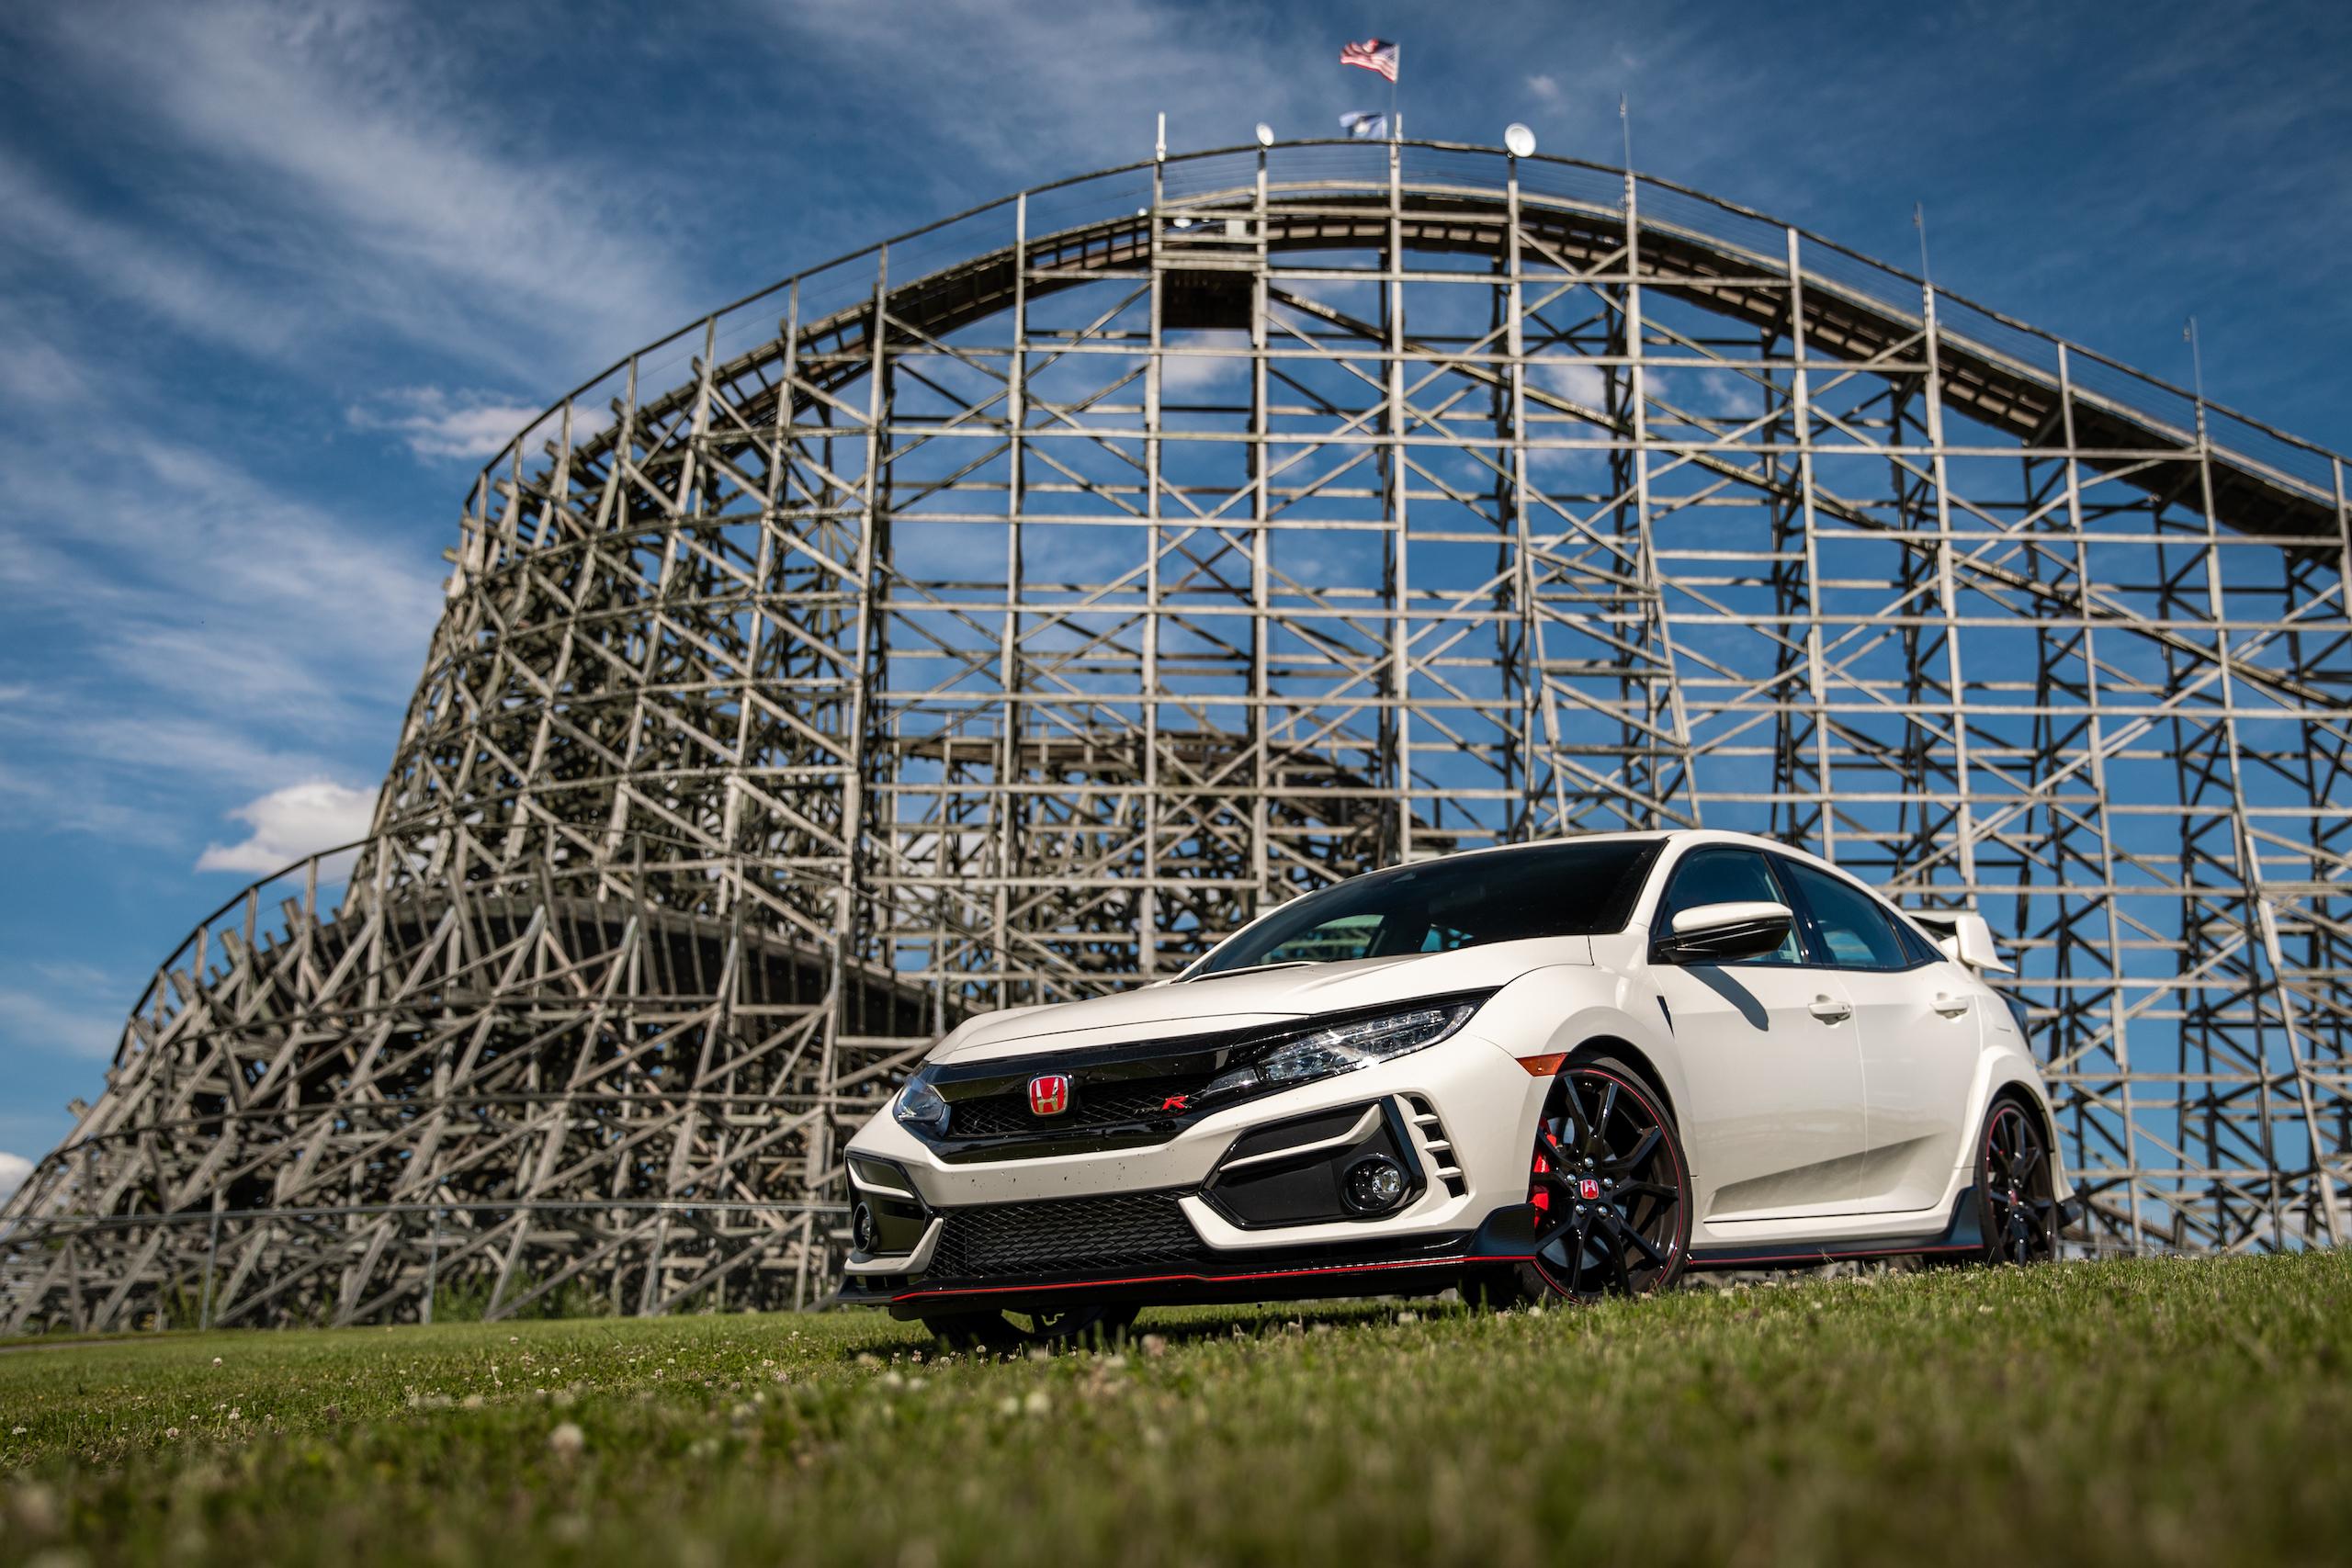 2020 Honda Civic Type R front three-quarter roller coaster